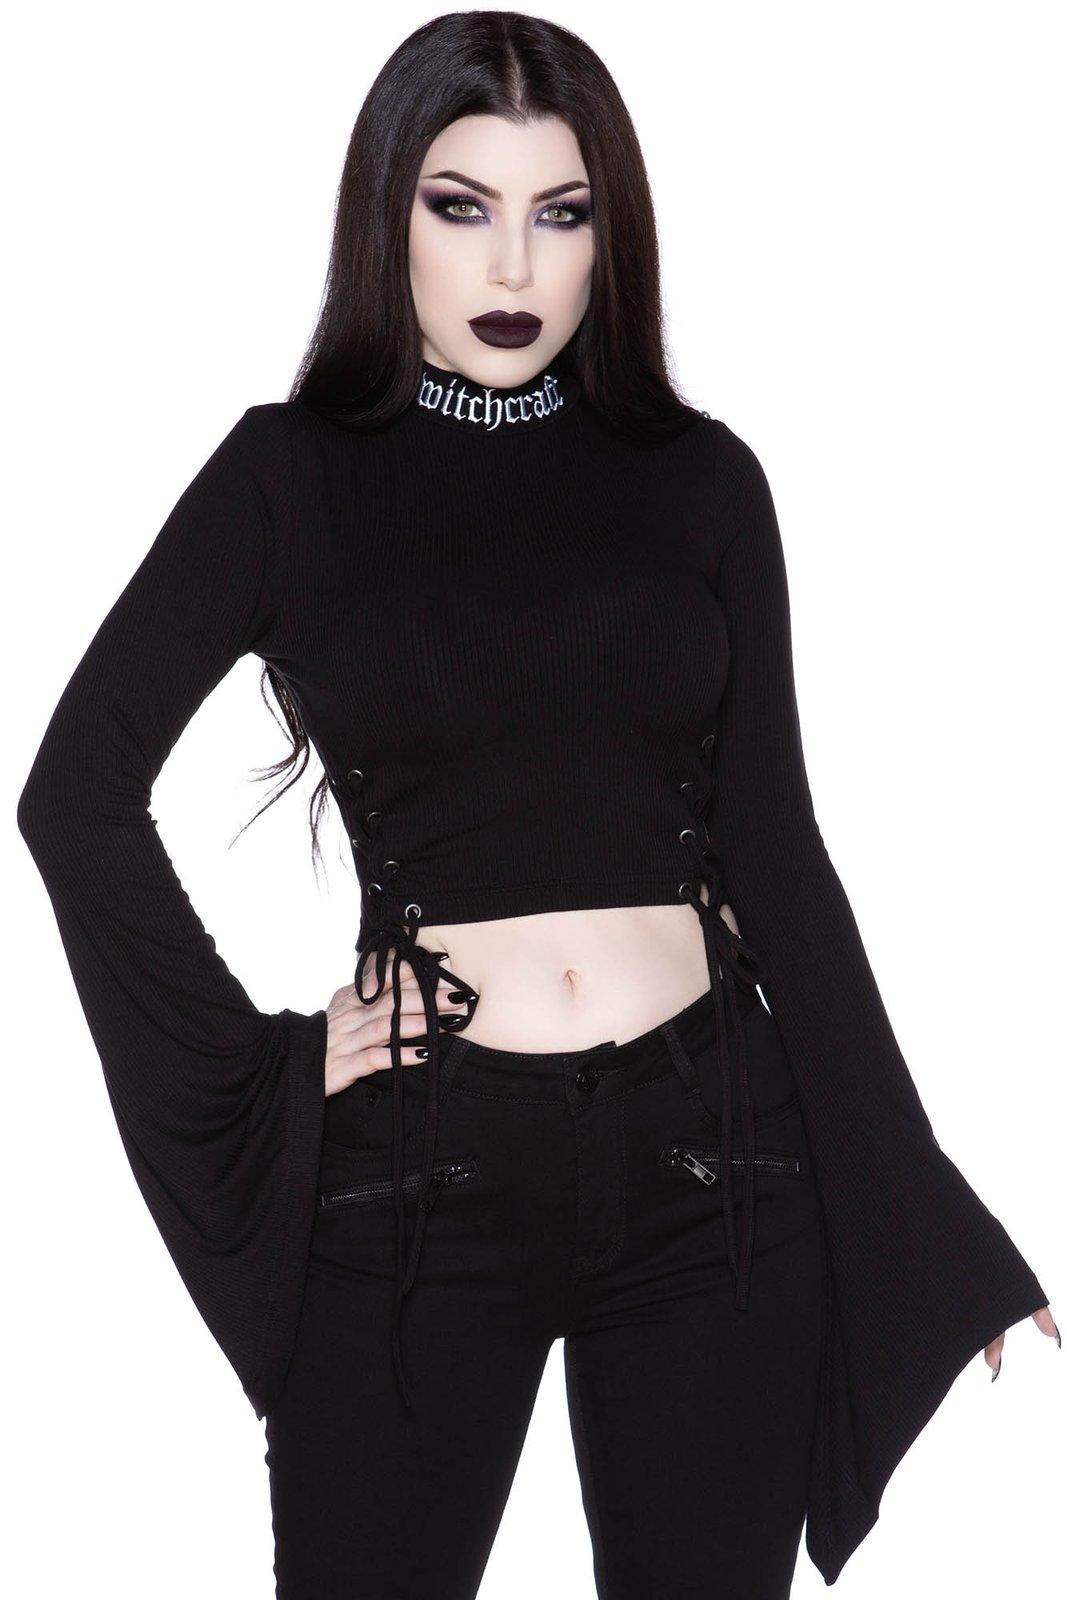 Cindy Long Sleeve Top Black